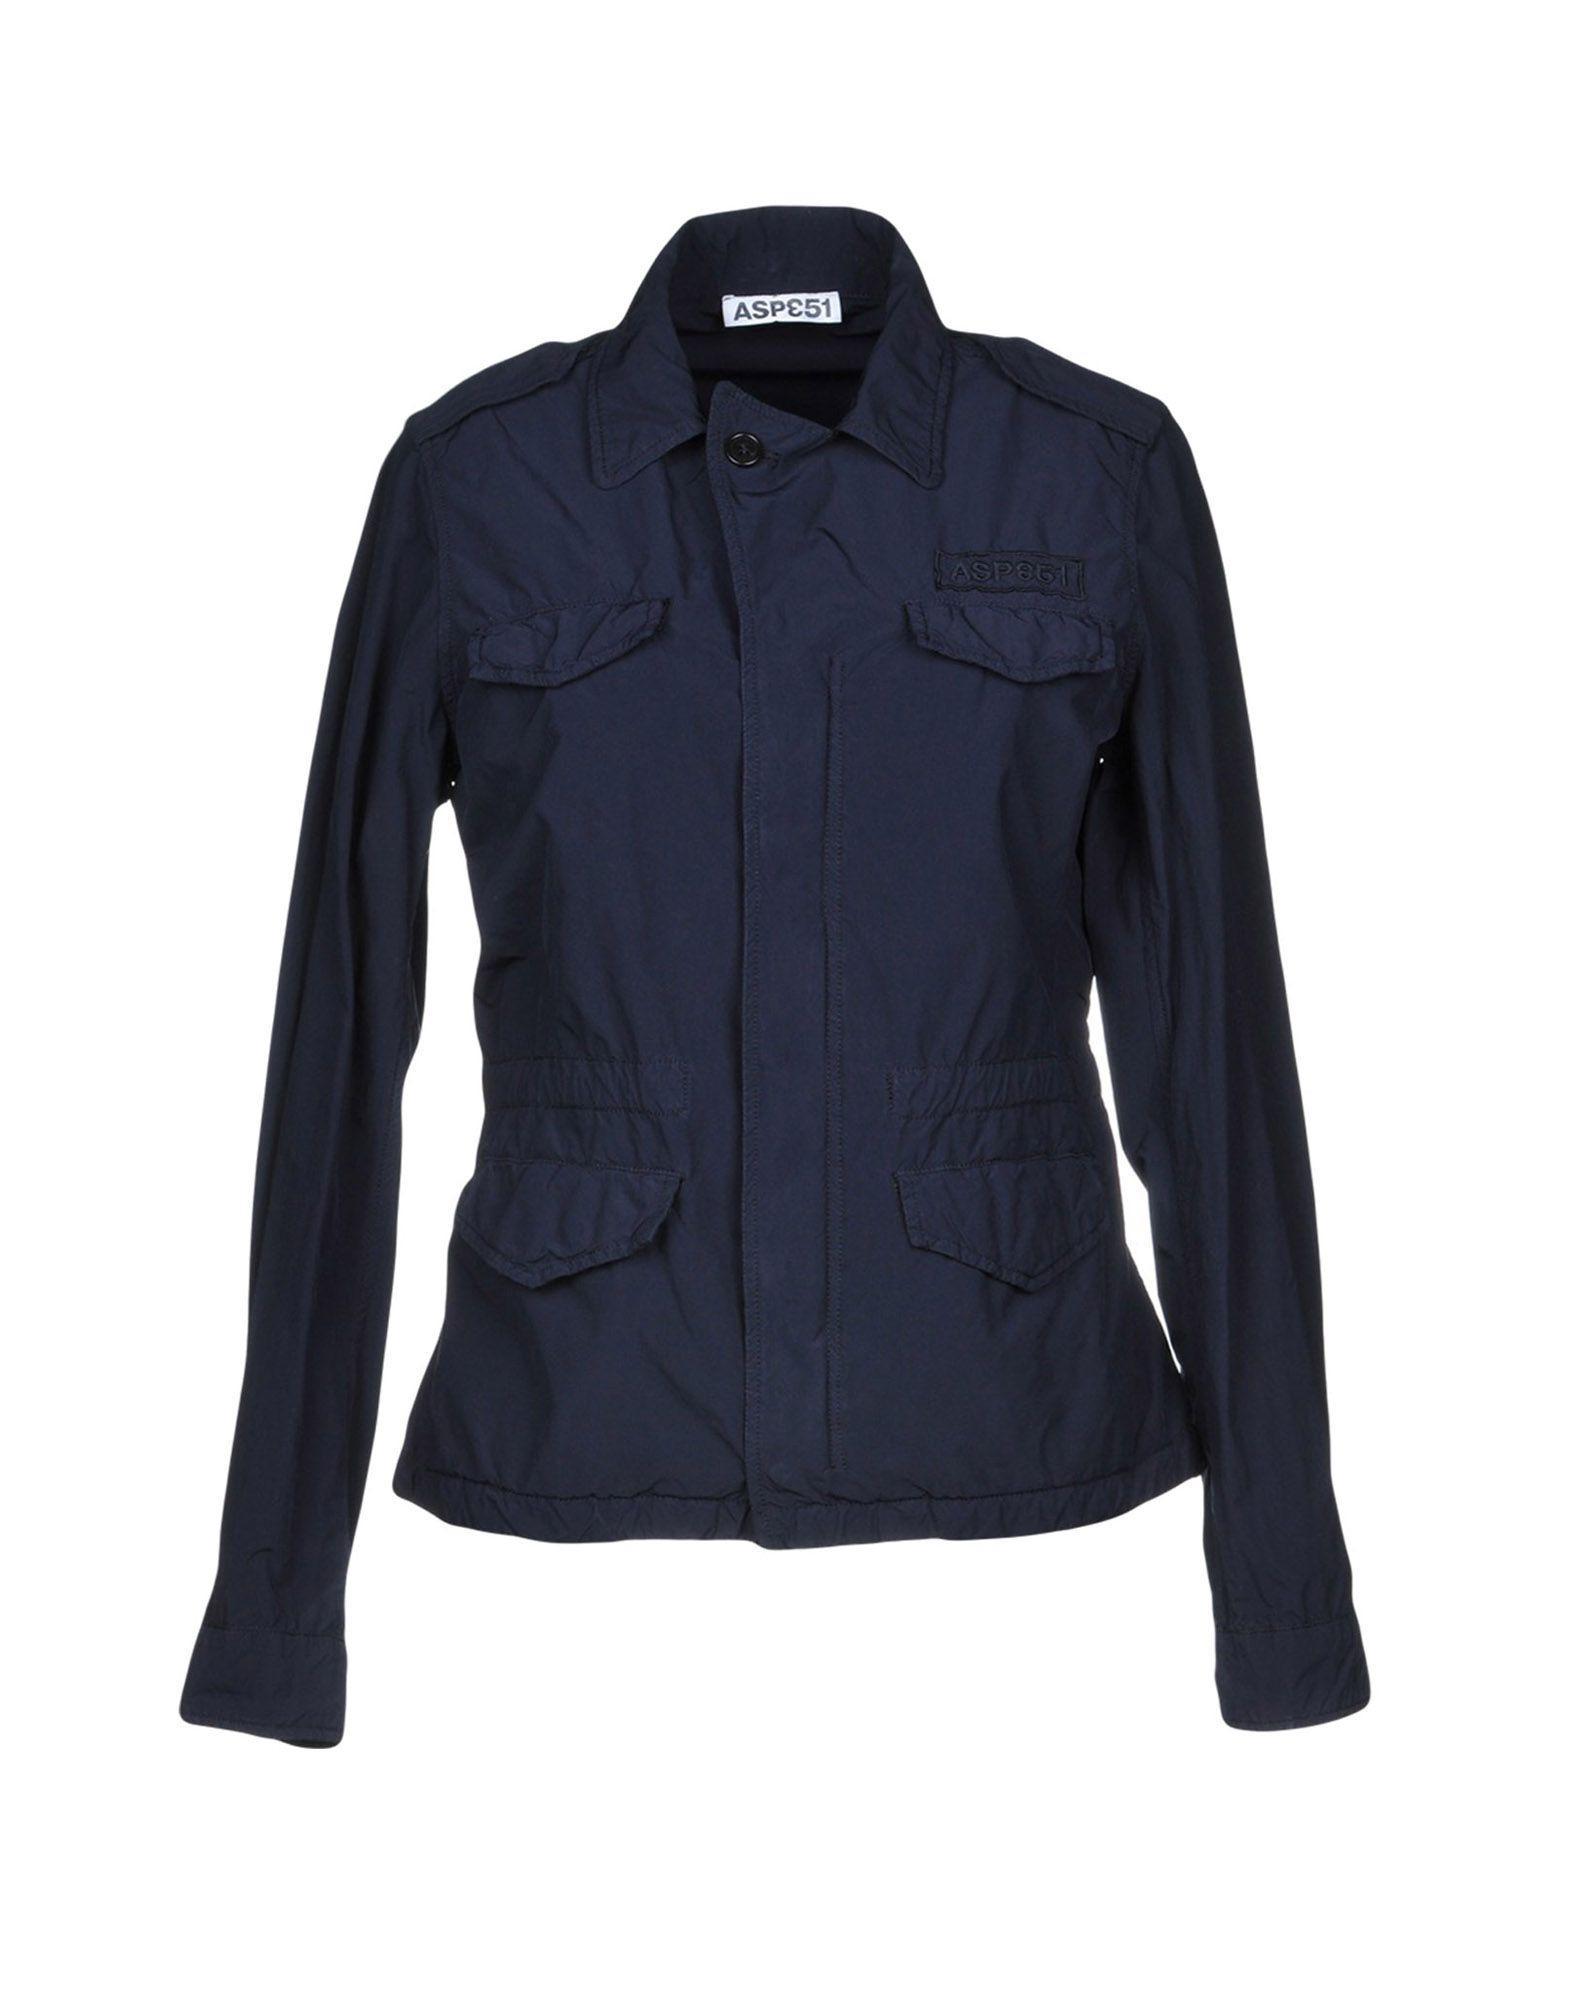 Aspesi Jackets In Dark Blue